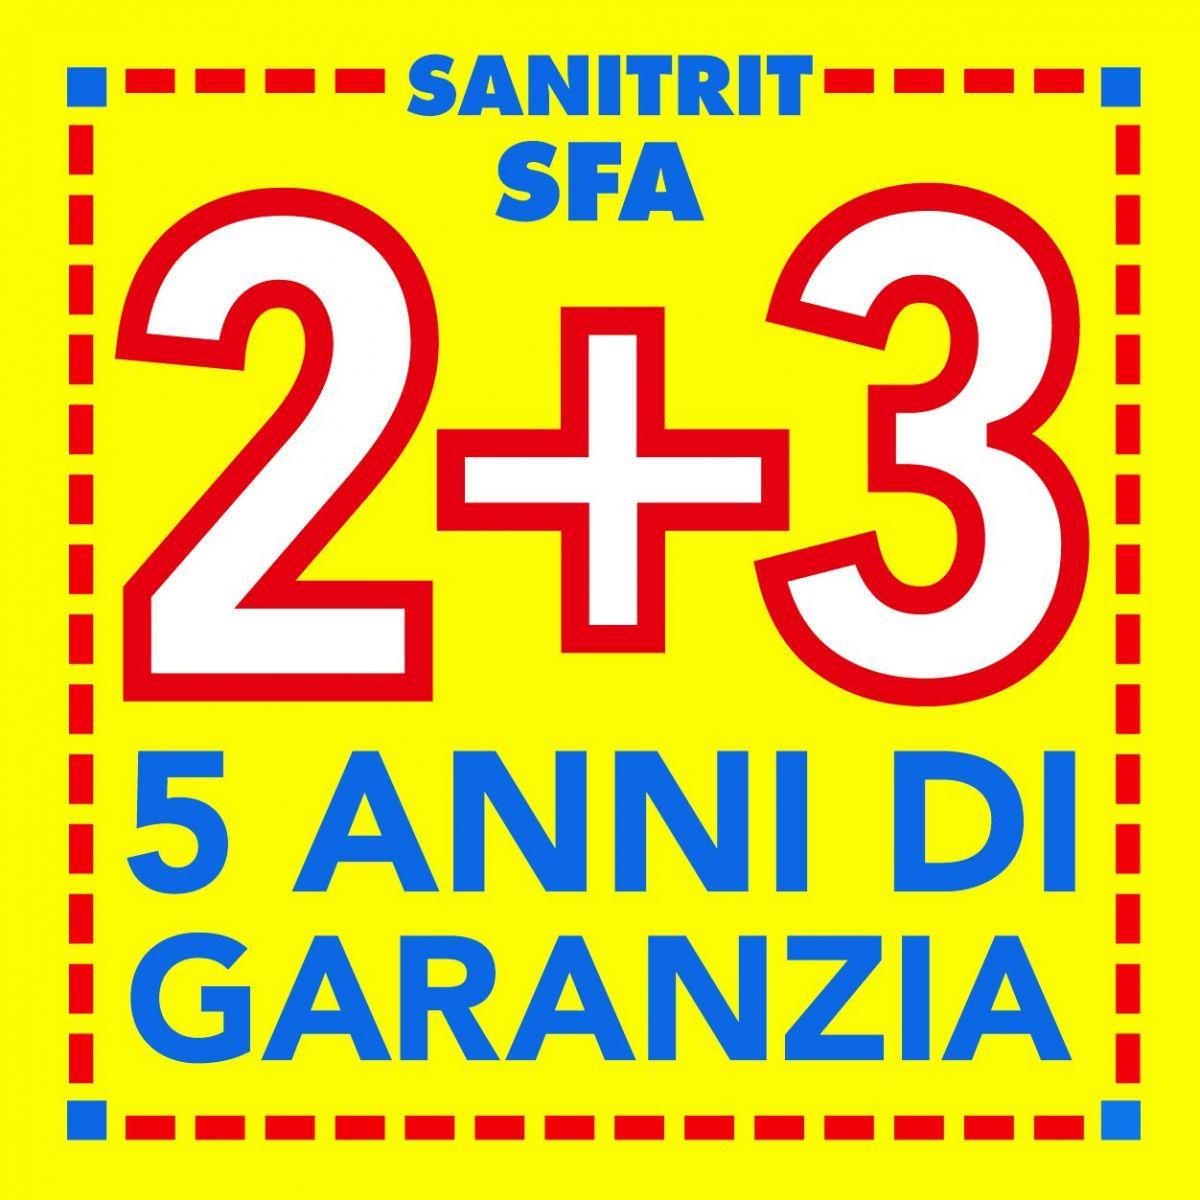 Sanipack Pro Up Sanitrit Sfa Italia